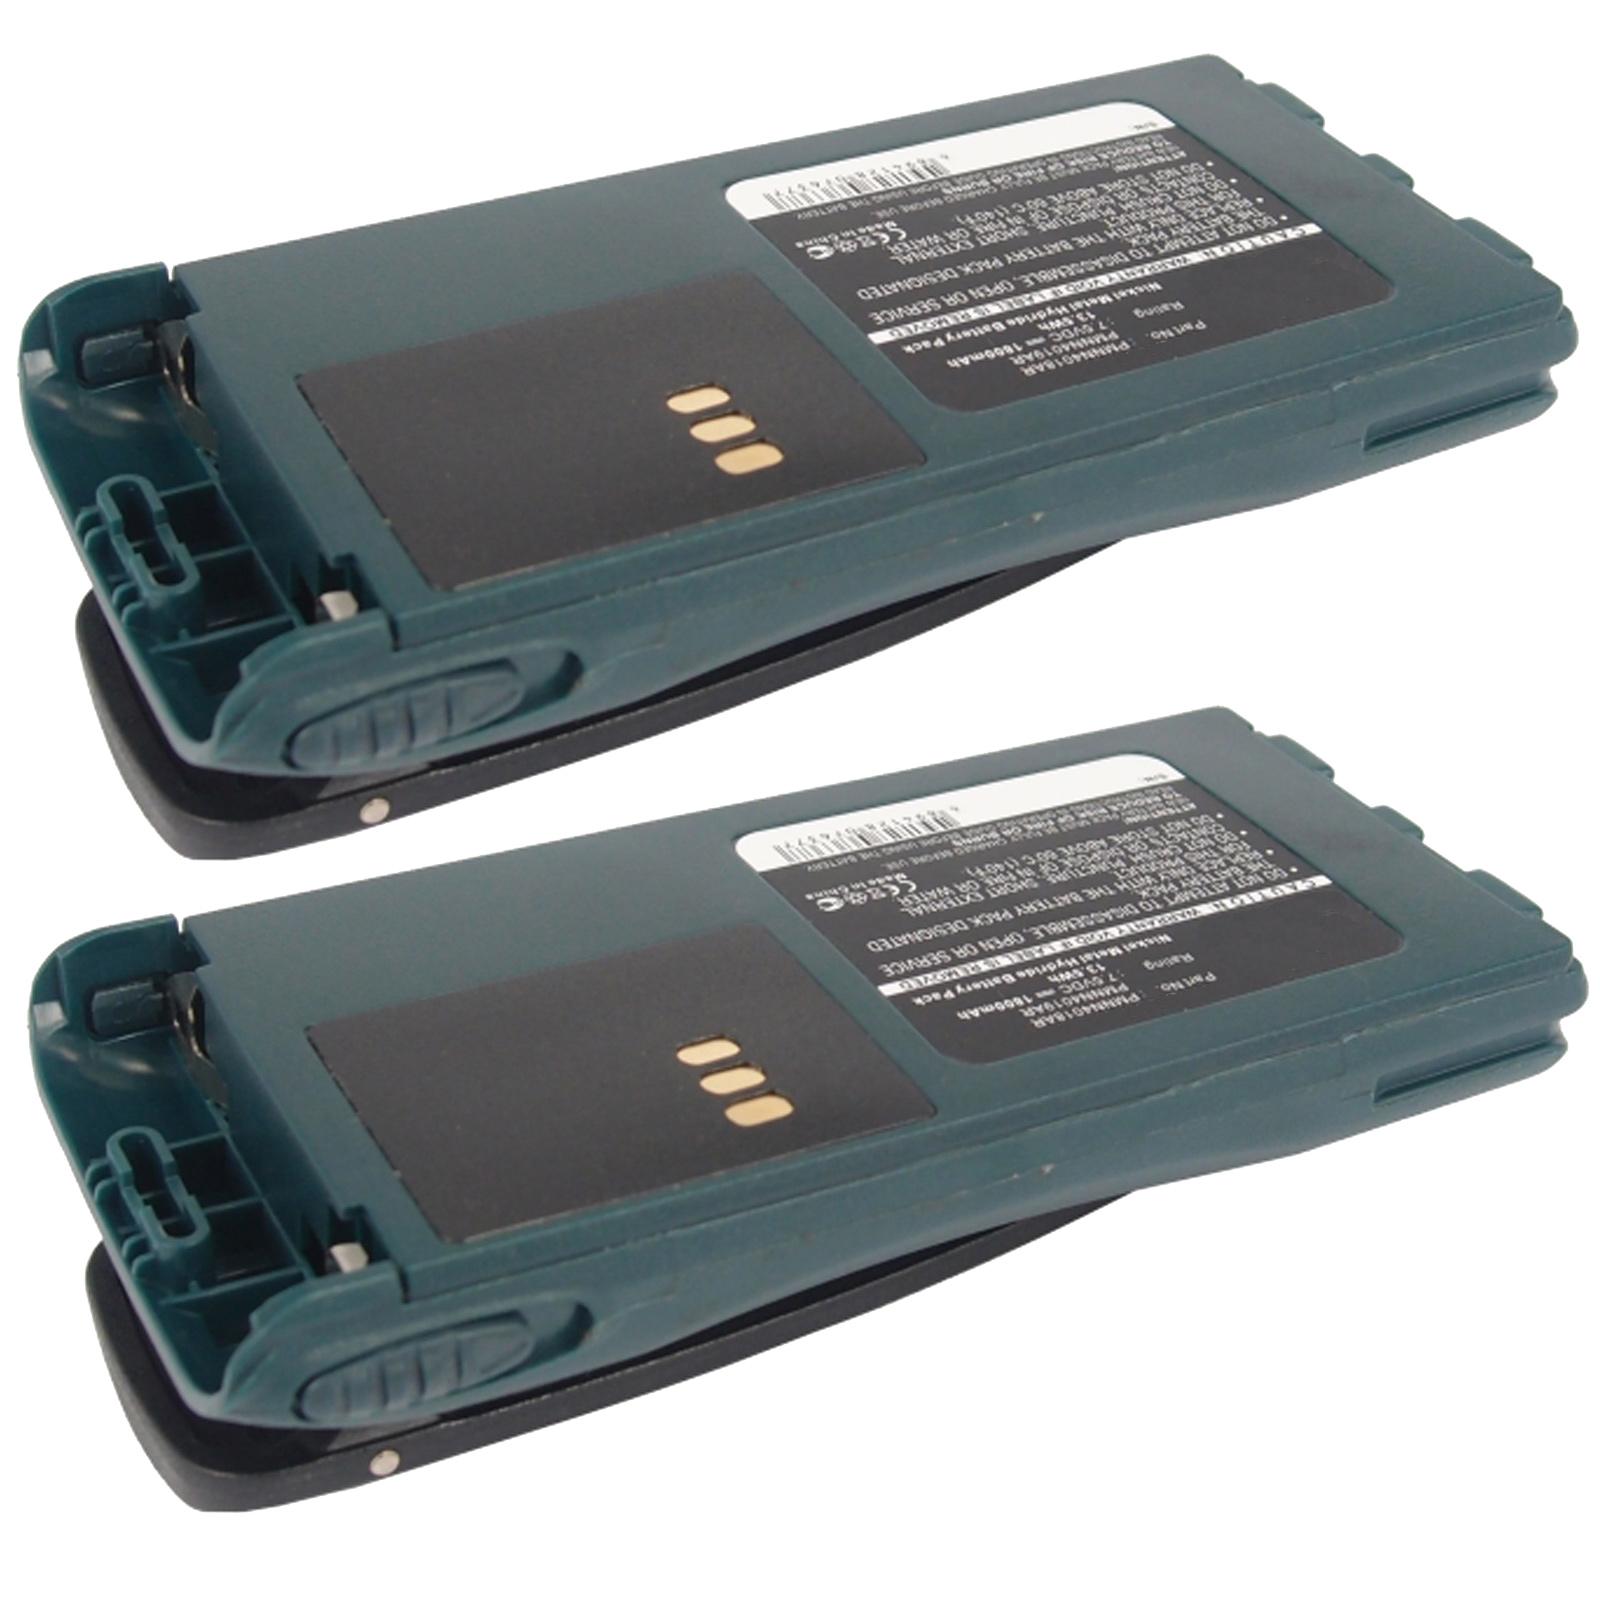 2x 7.5V 2500mAh Ni-MH FRS 2way Radio Battery Fits Motorol...